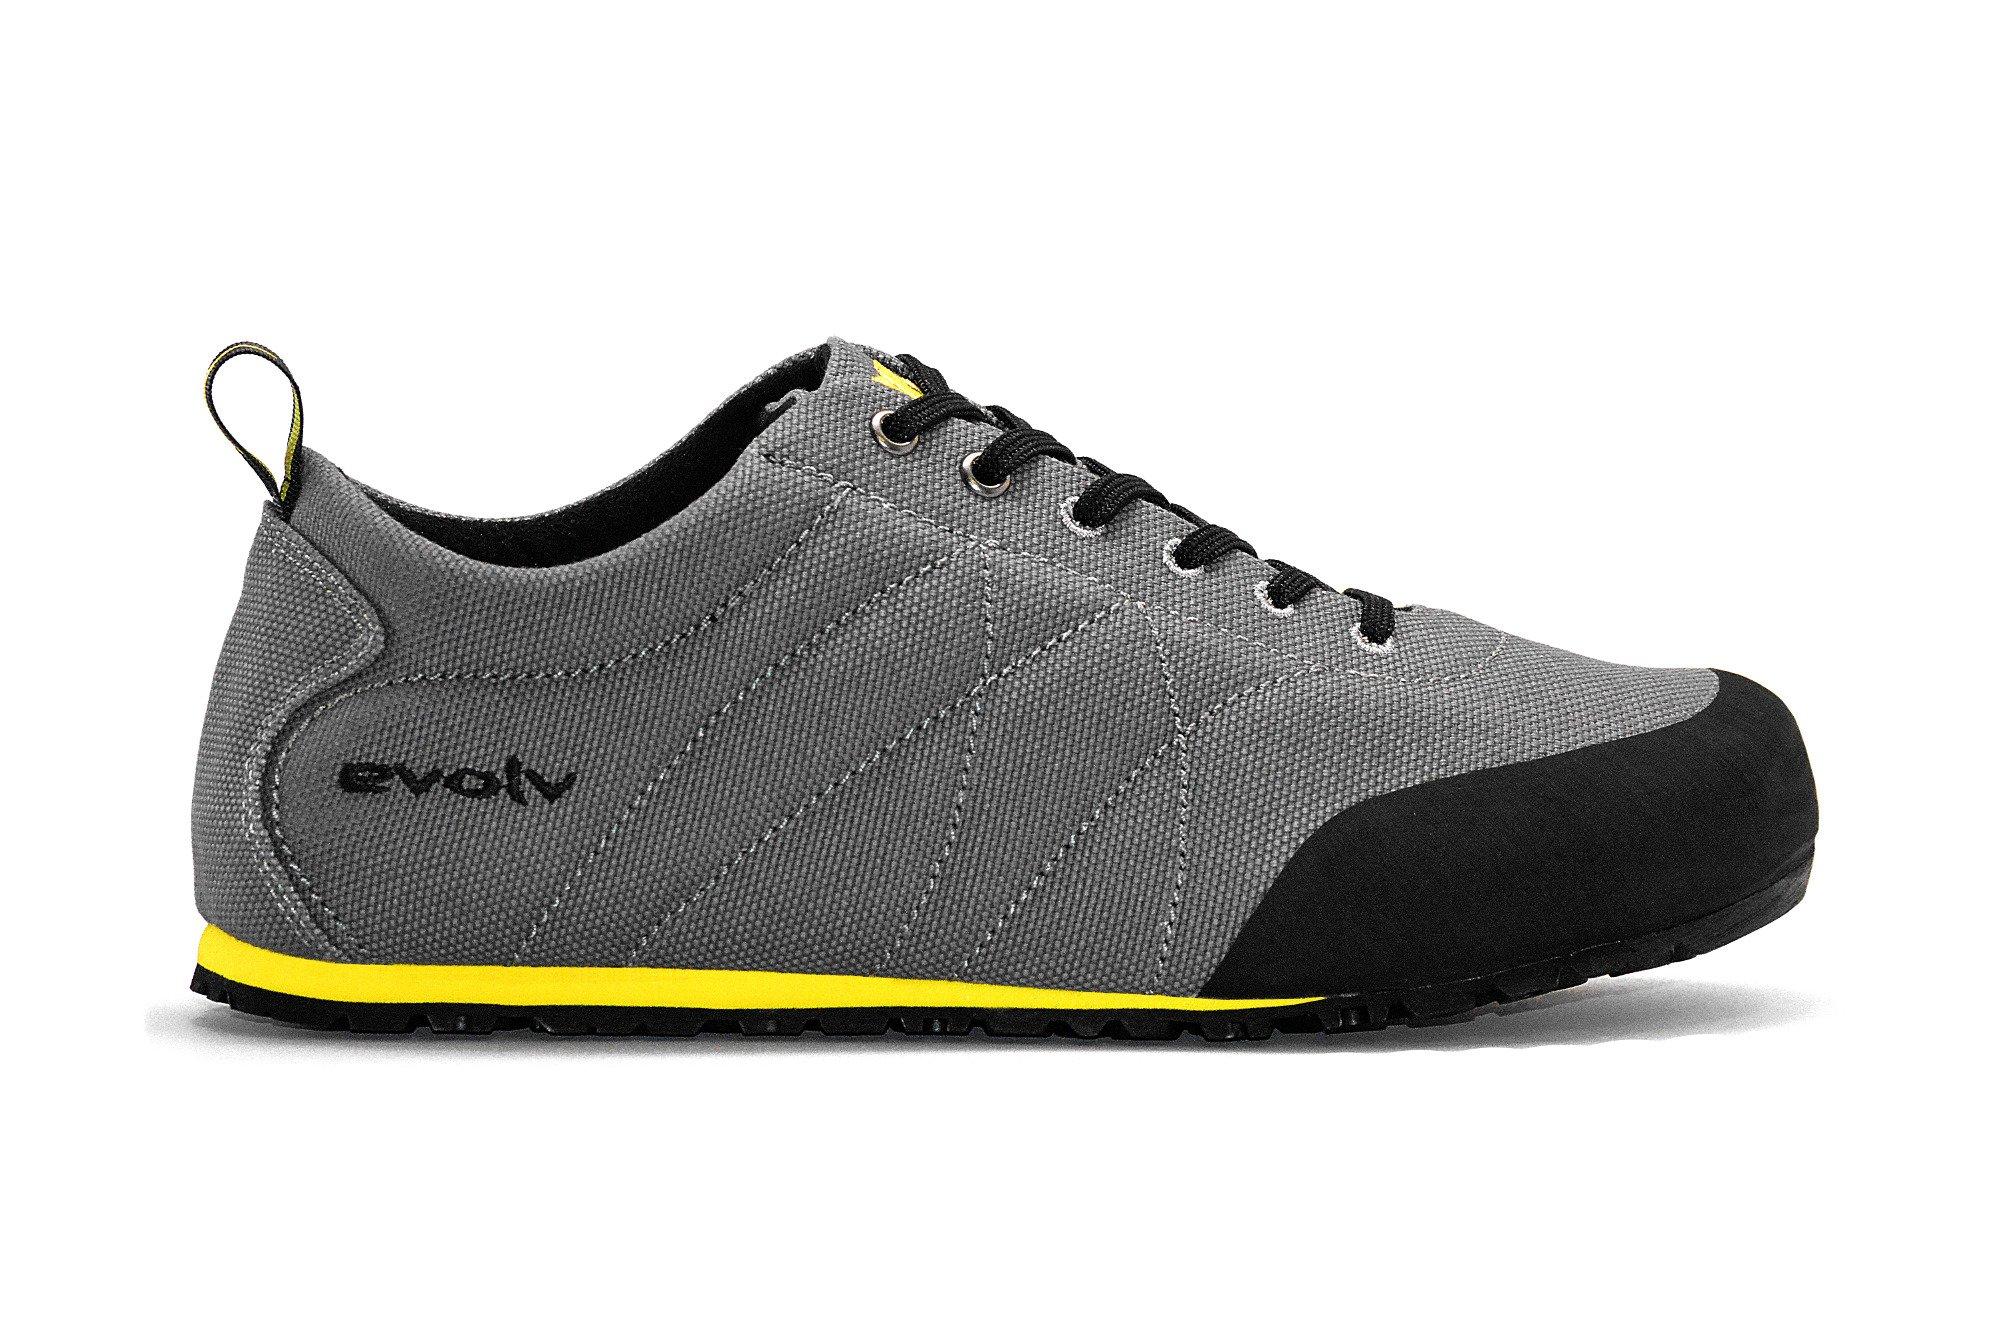 Evolv Cruzer Psyche Approach Shoe - Slate 14 by Evolv